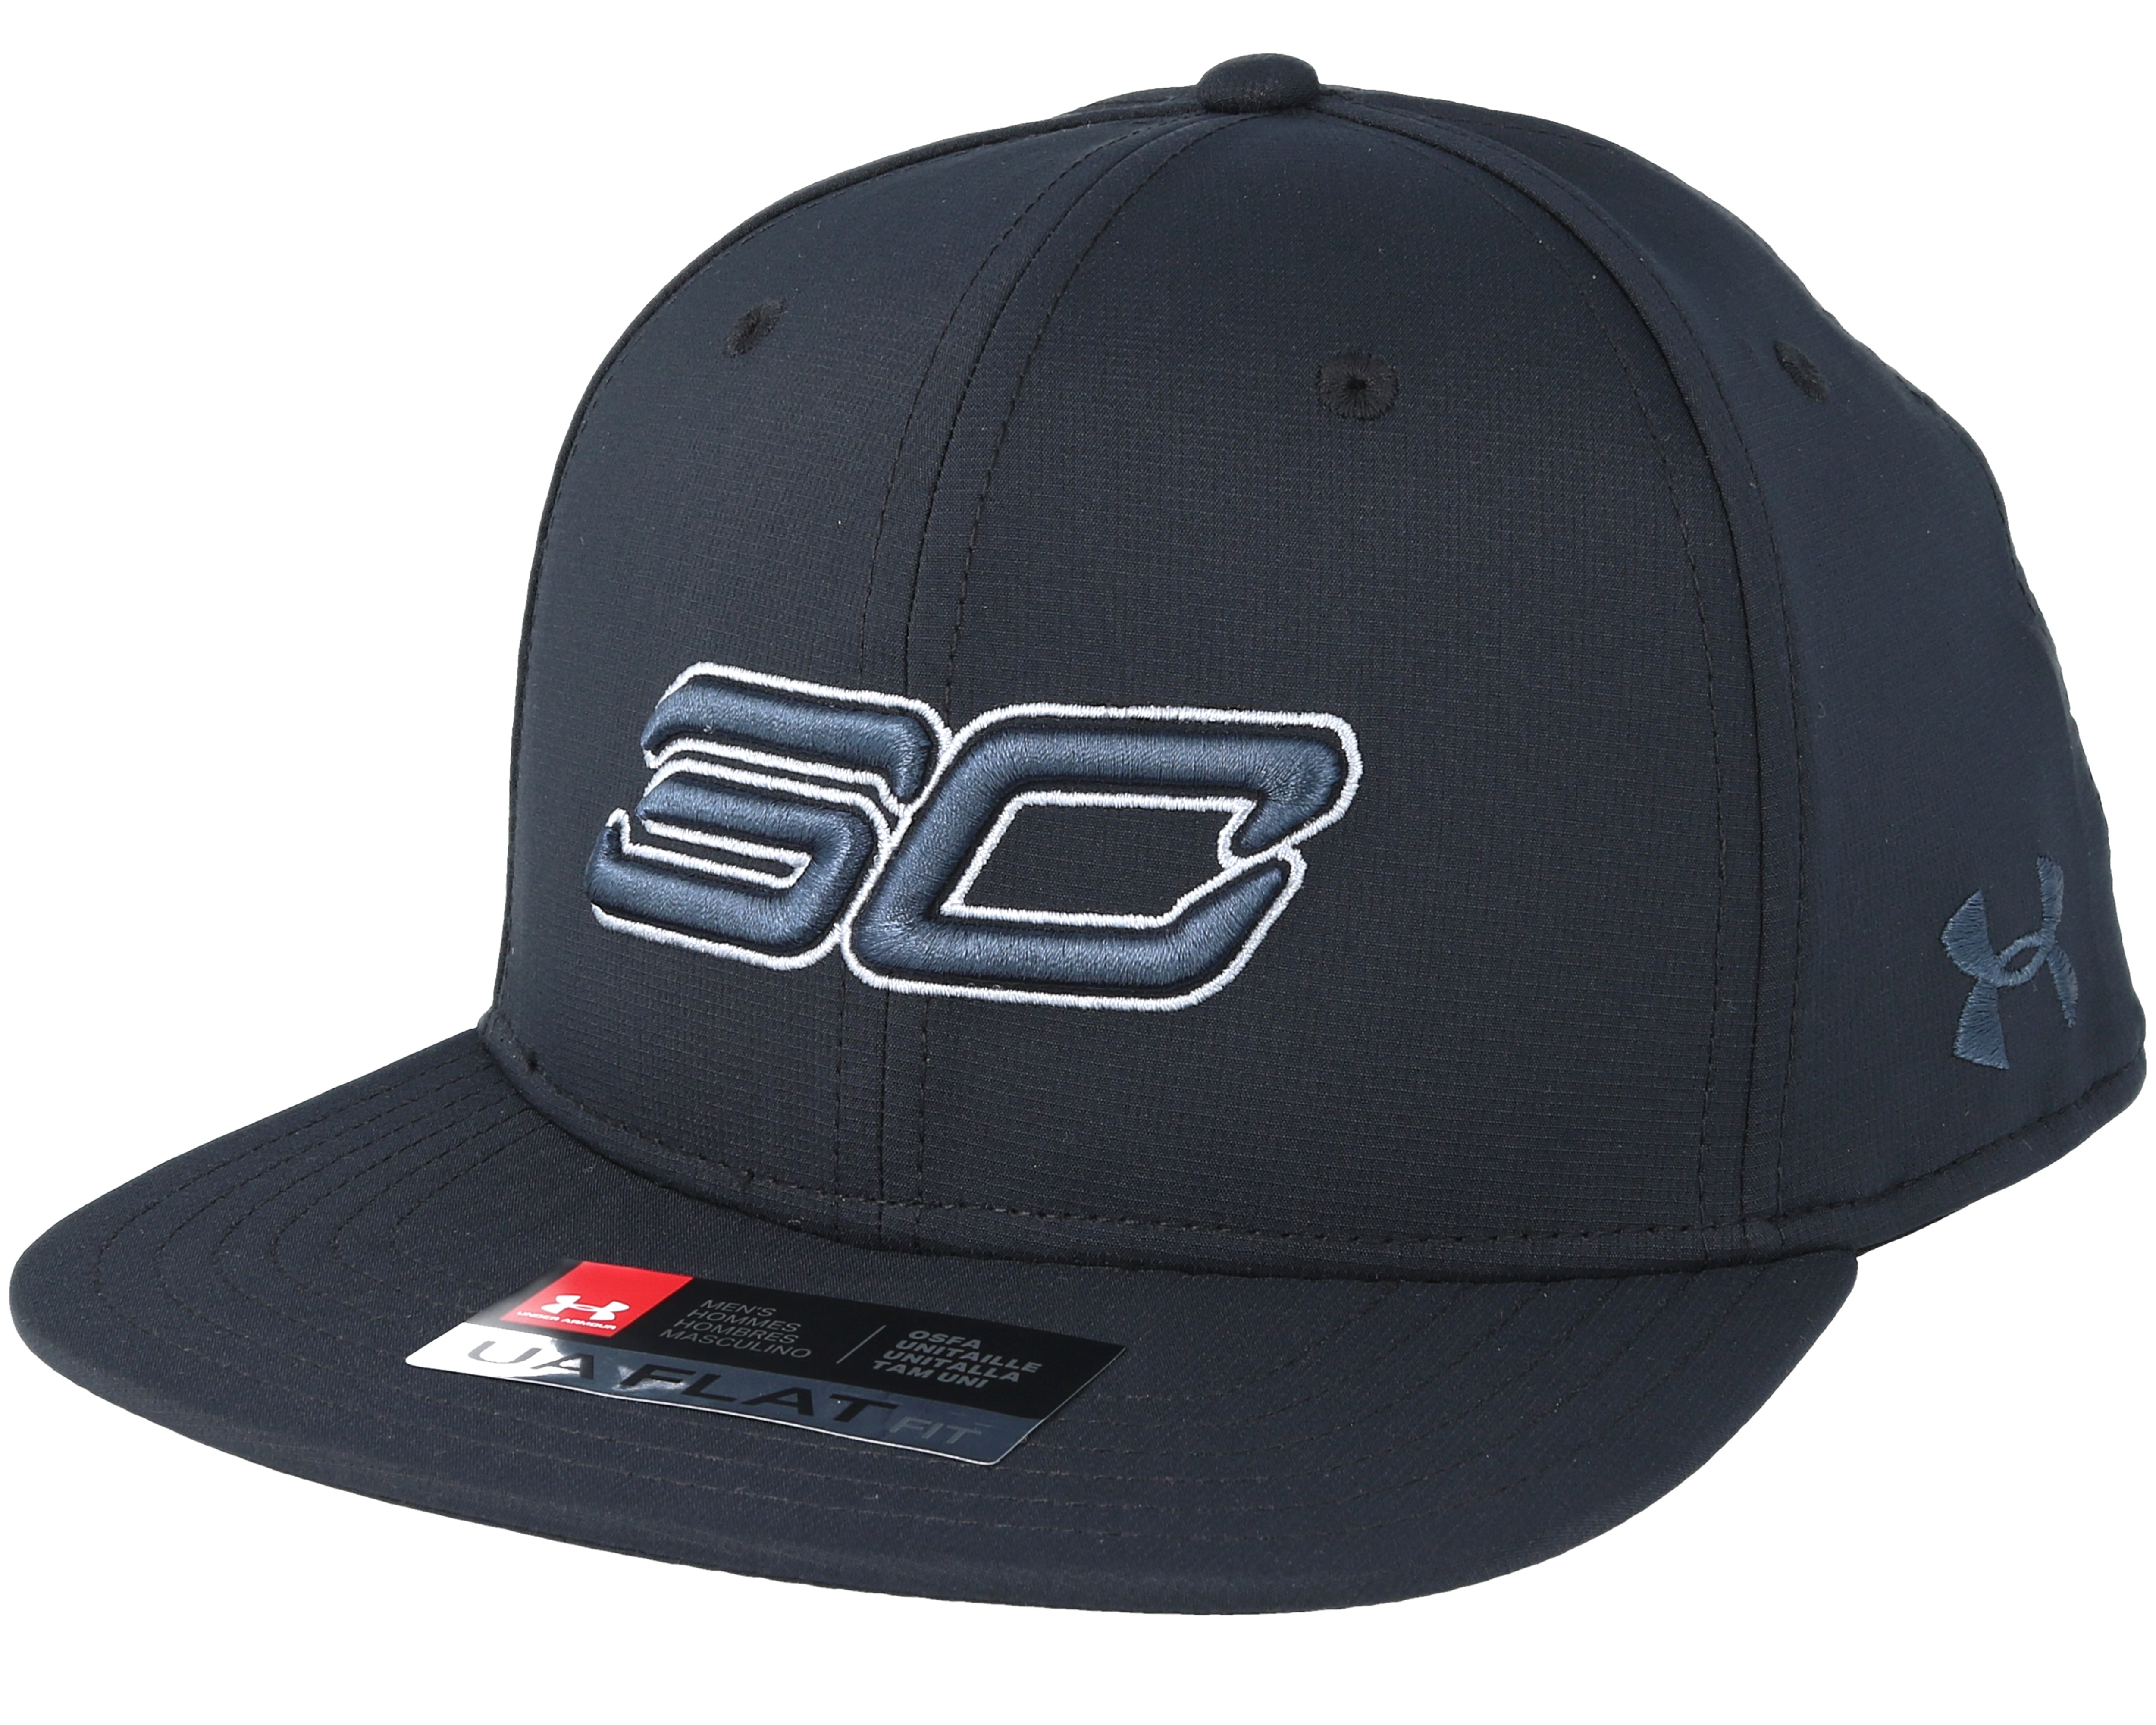 6ddefa24aa9 Sc30 Core Black Snapback - Under Armour caps